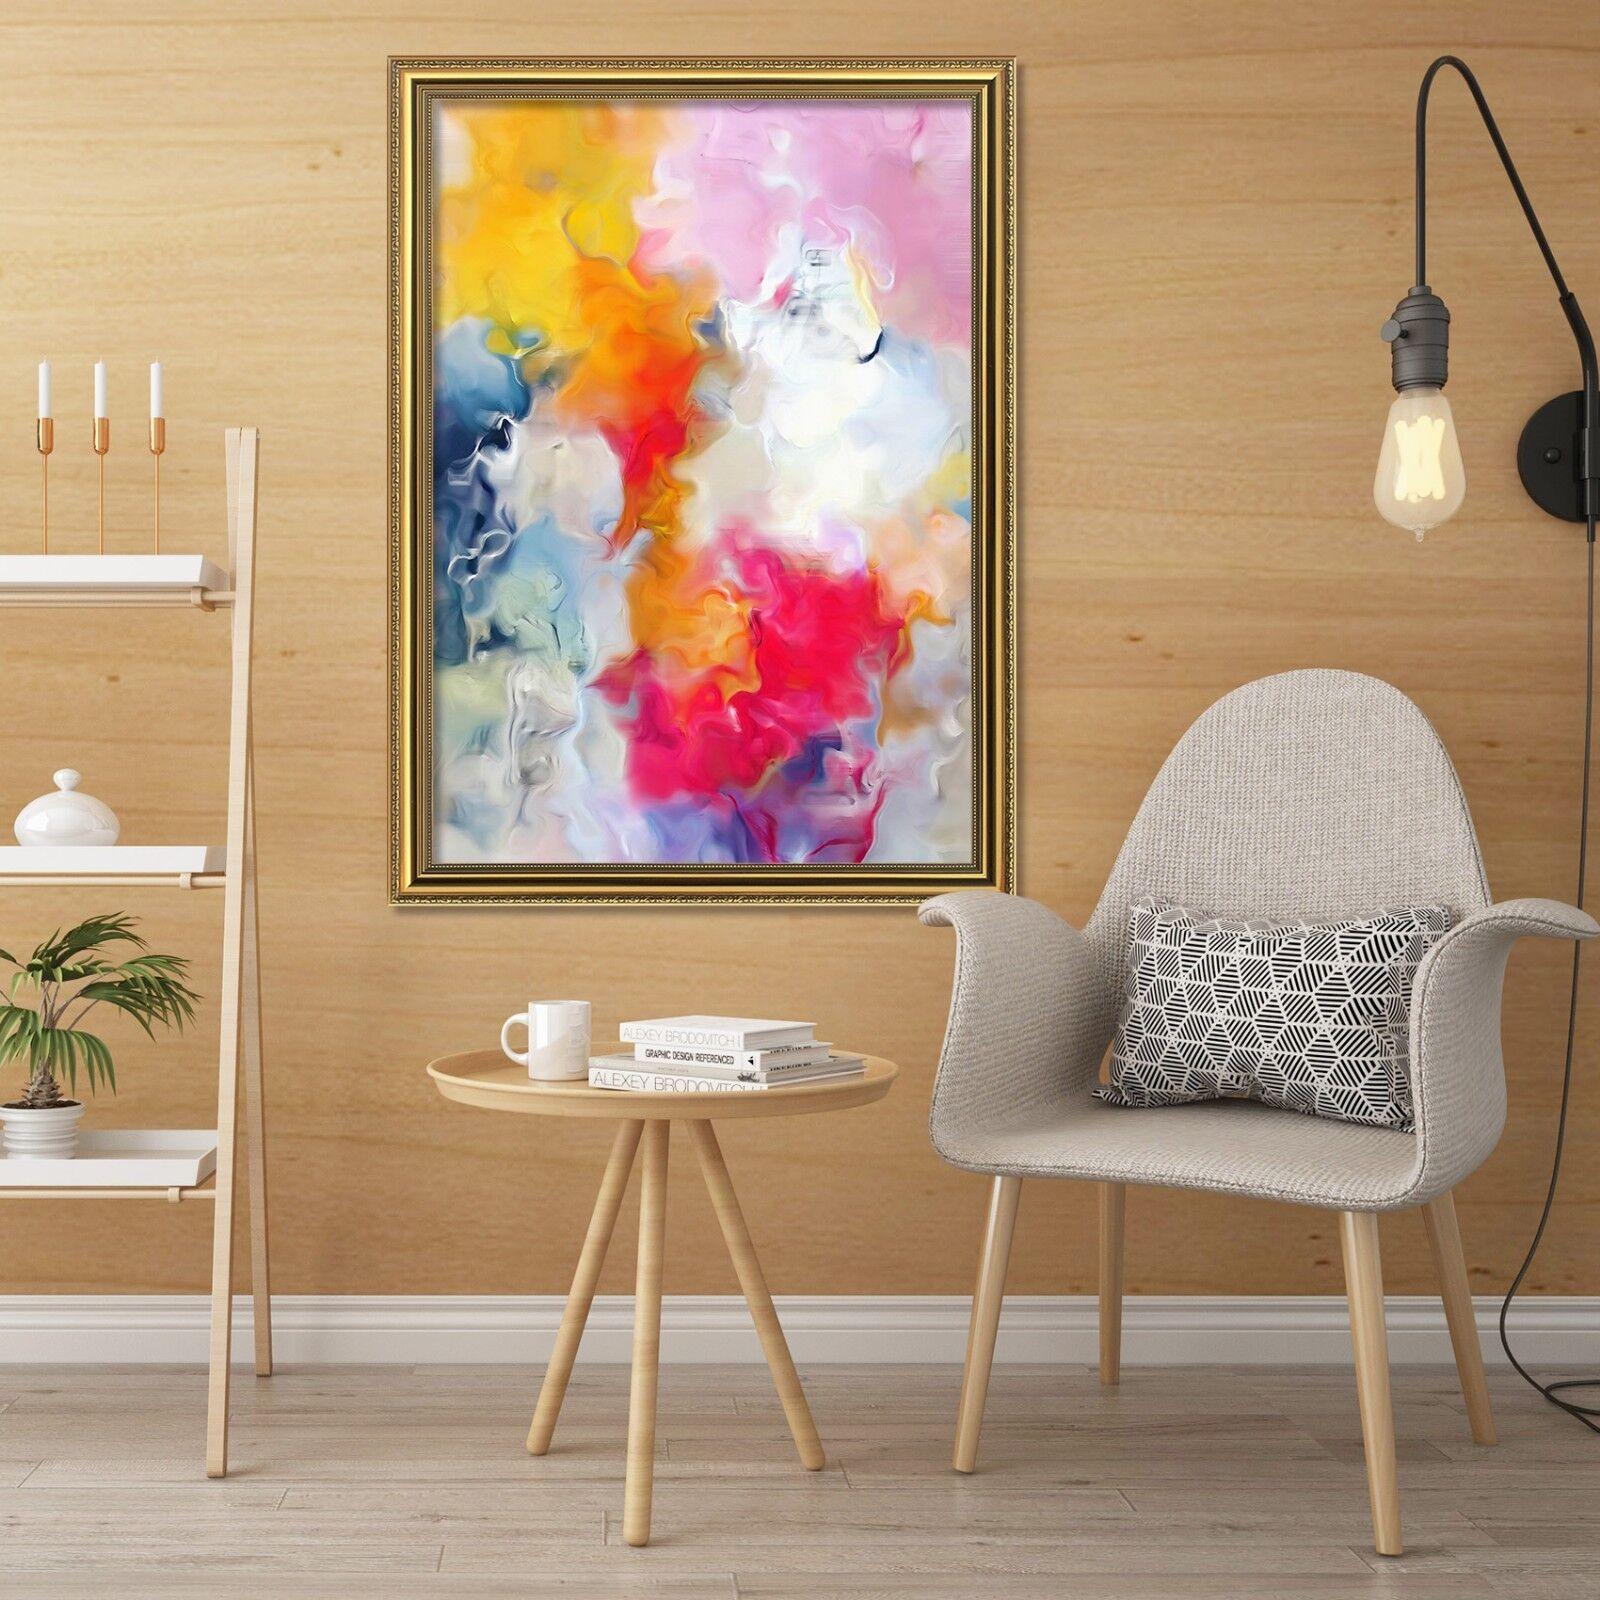 3D Couleur Art Pattern 5 Fake Framed Poster Home Decor Print Painting Unique Art